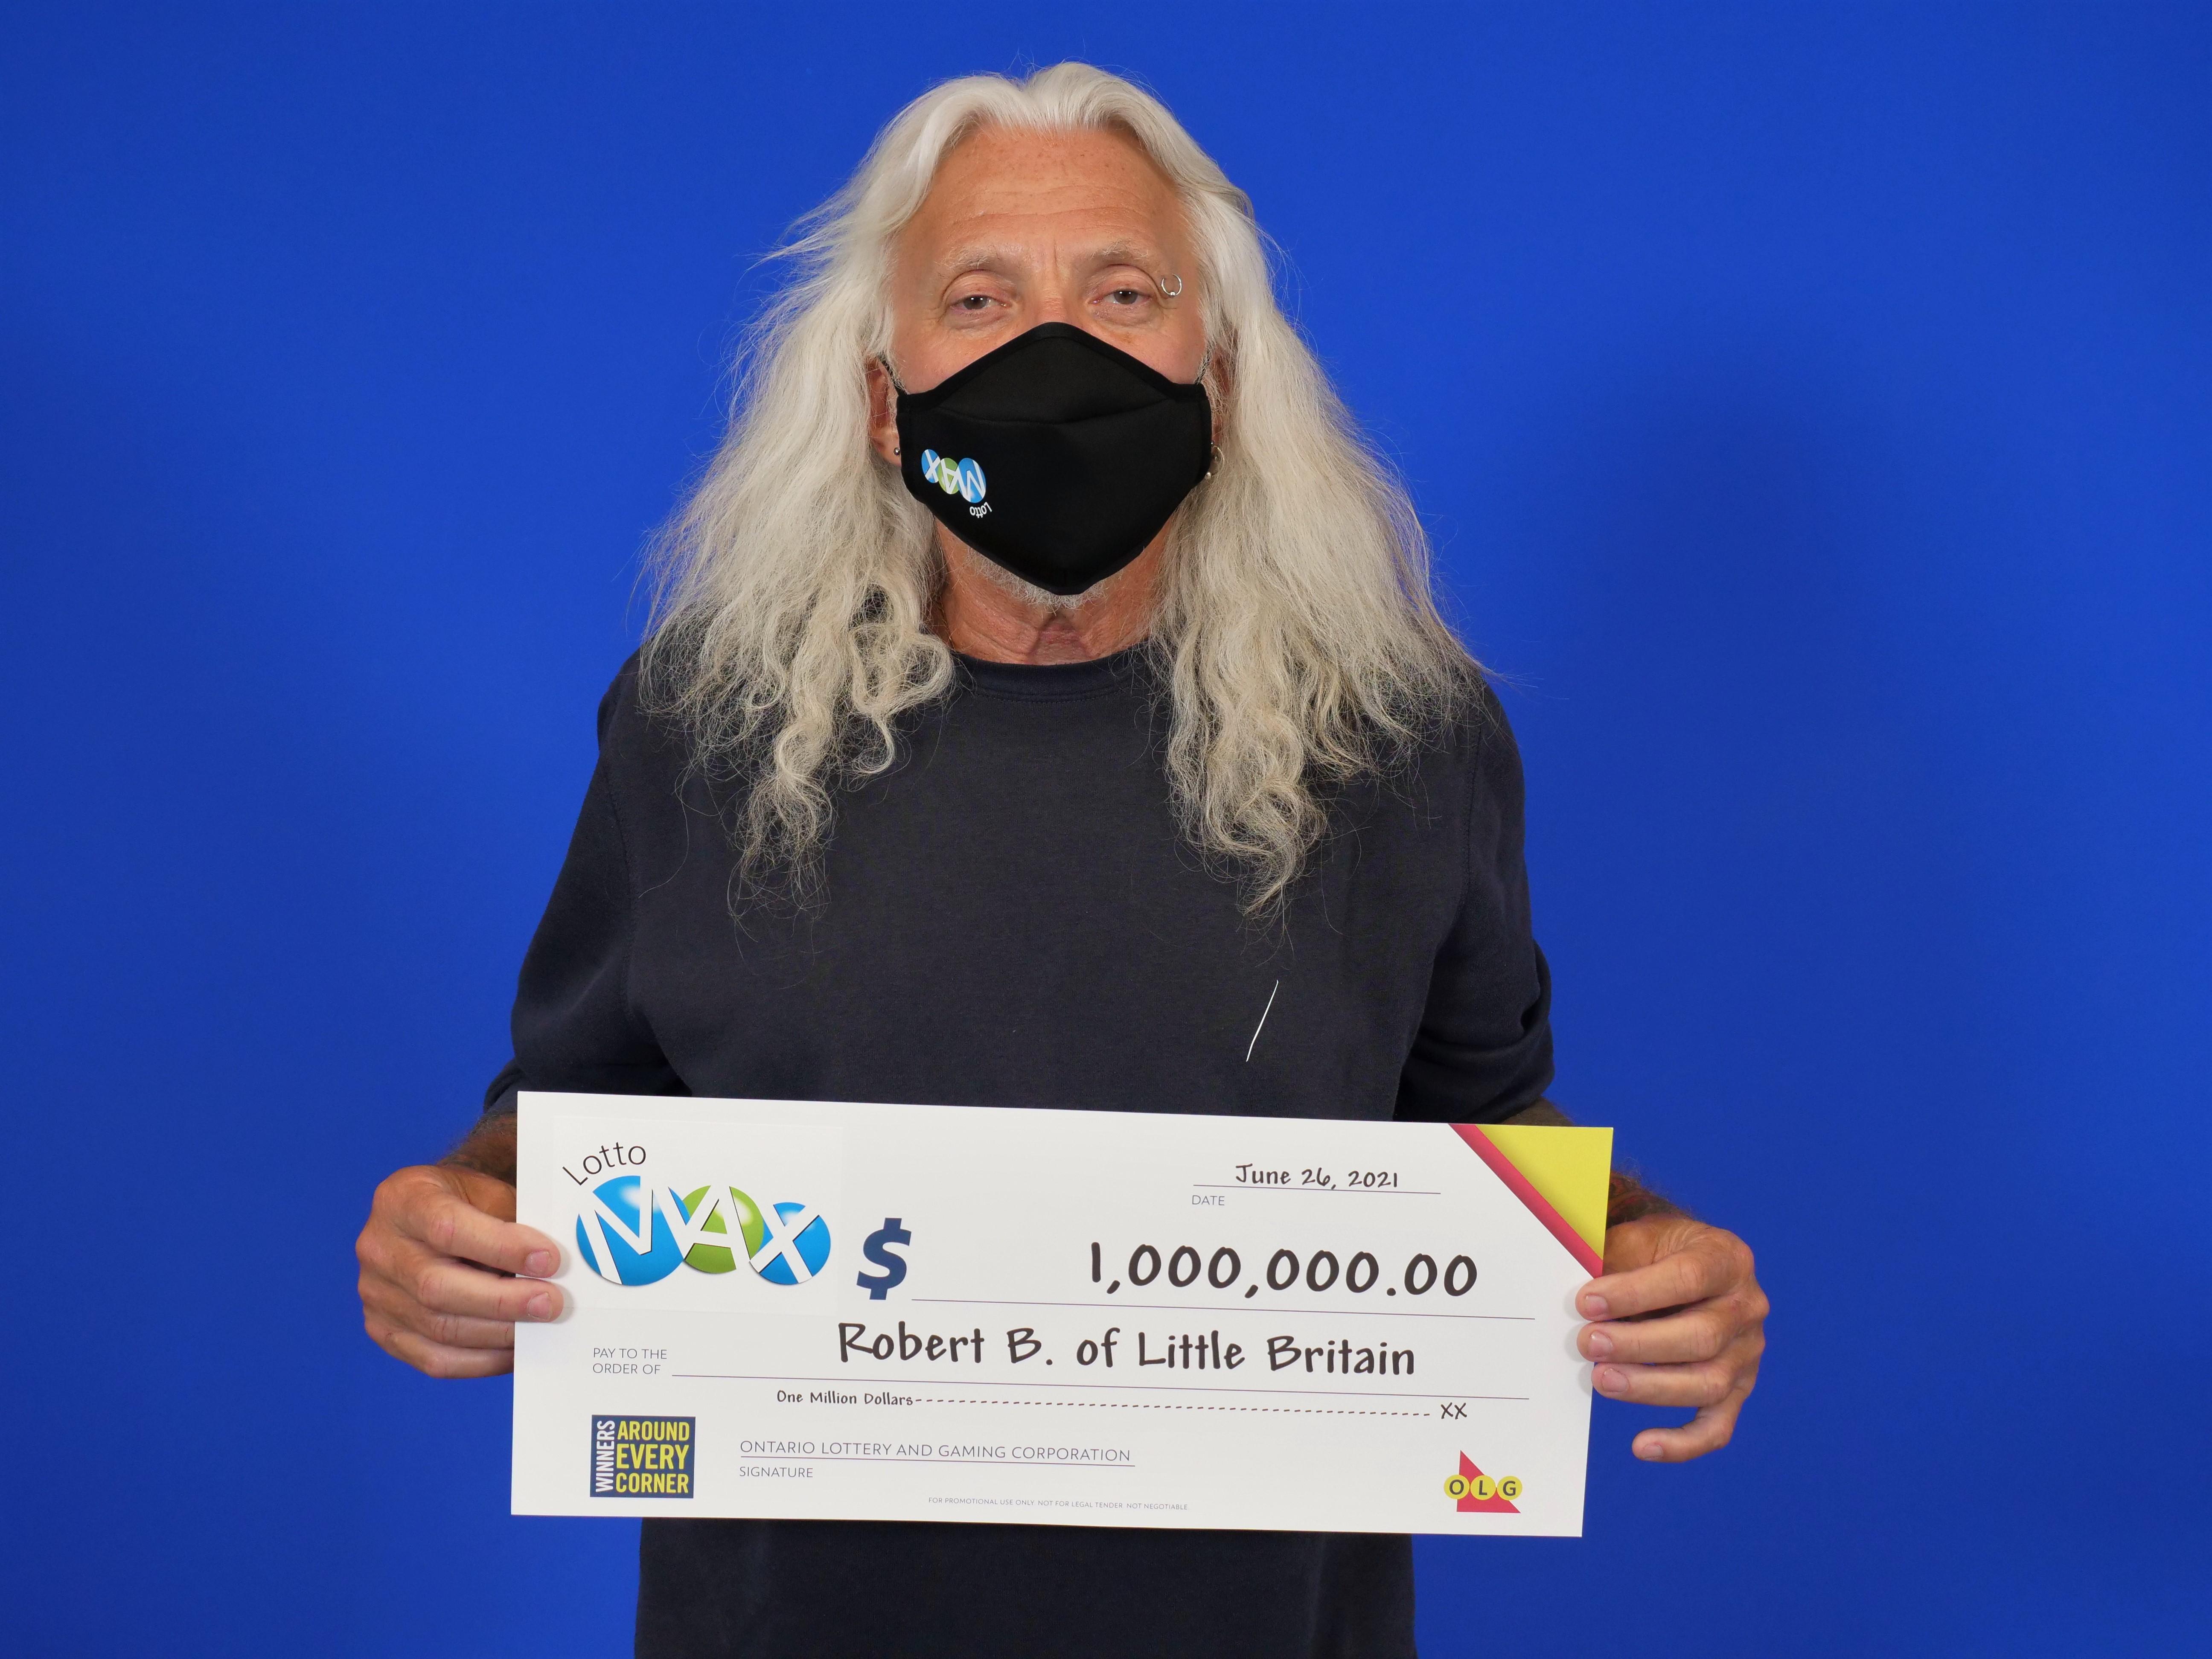 Little Britain resident wins million dollar prize